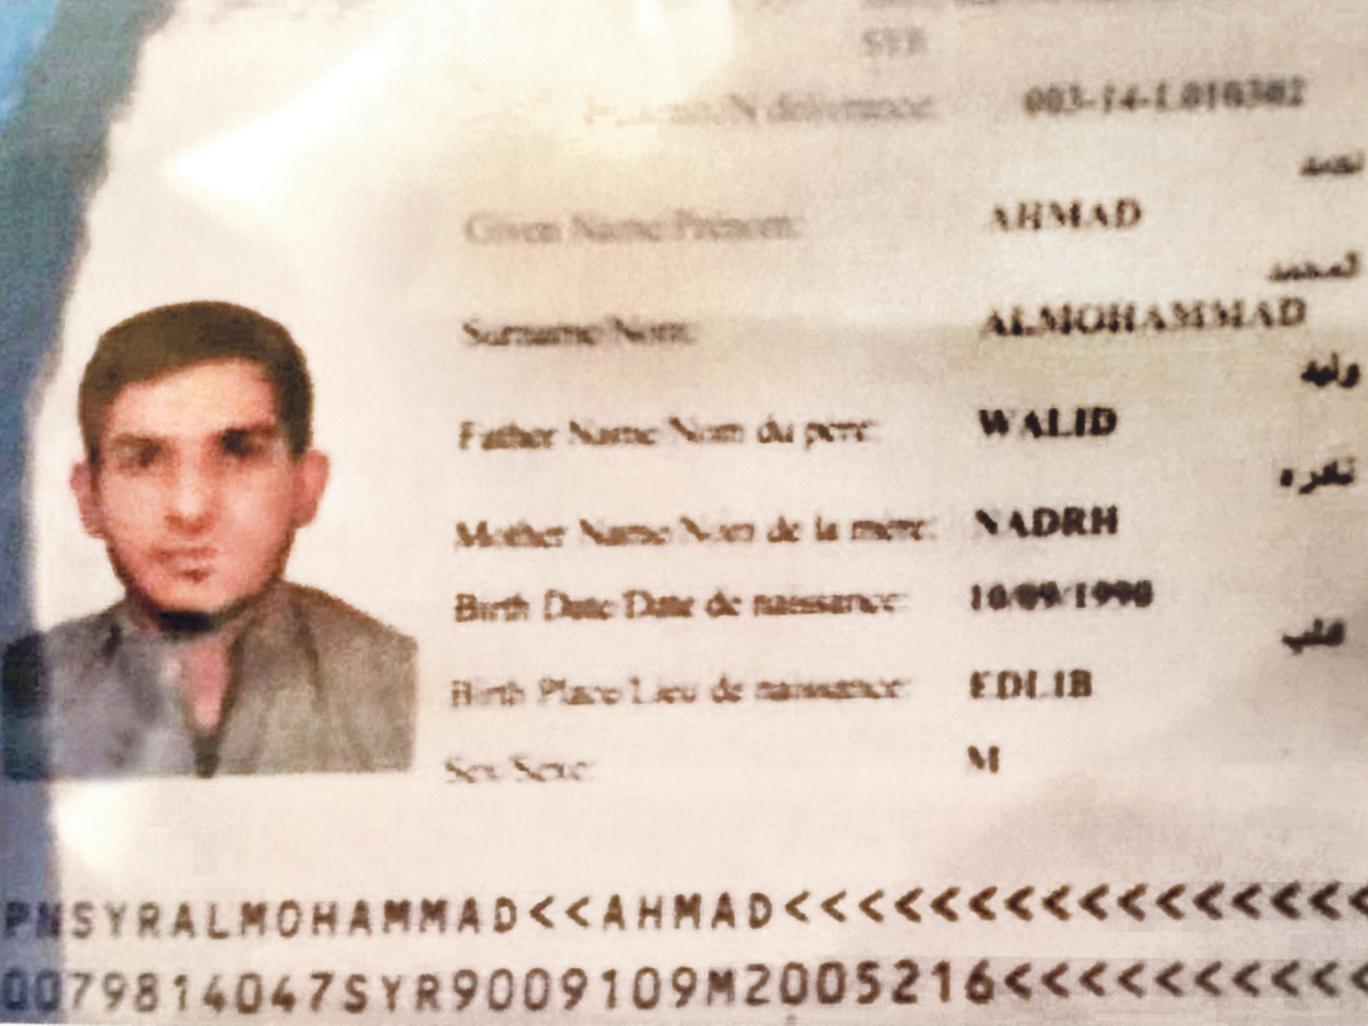 Paris-Attacks-Passport-Ahmad-Al-Mohammad